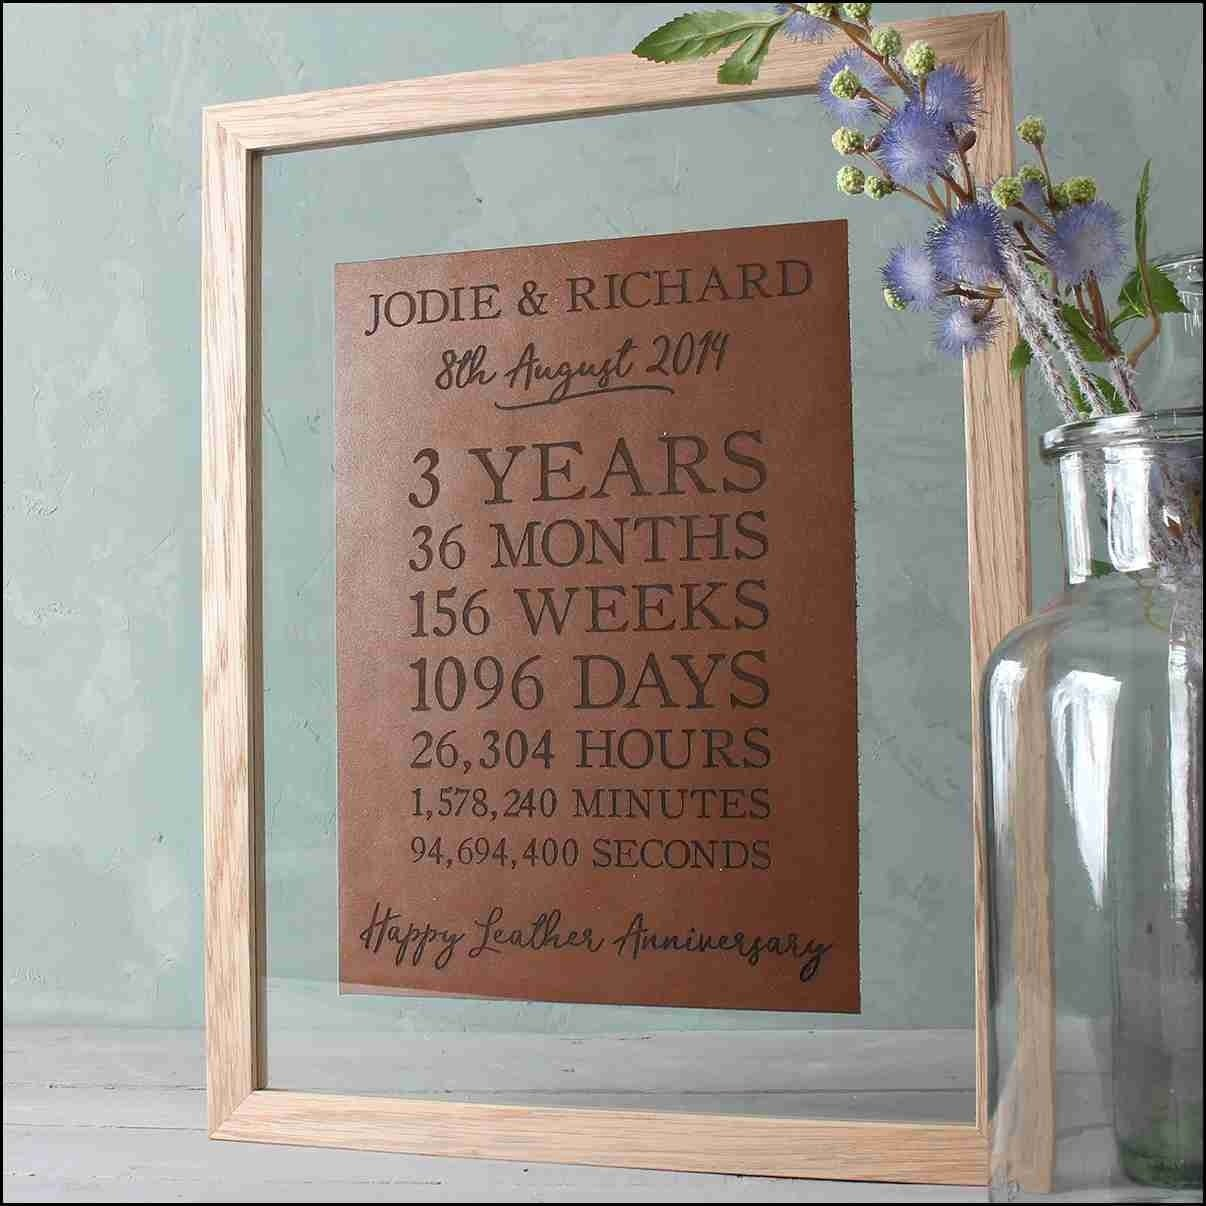 10 Elegant Third Wedding Anniversary Gift Ideas third wedding anniversary gift ideas evgplc 2020